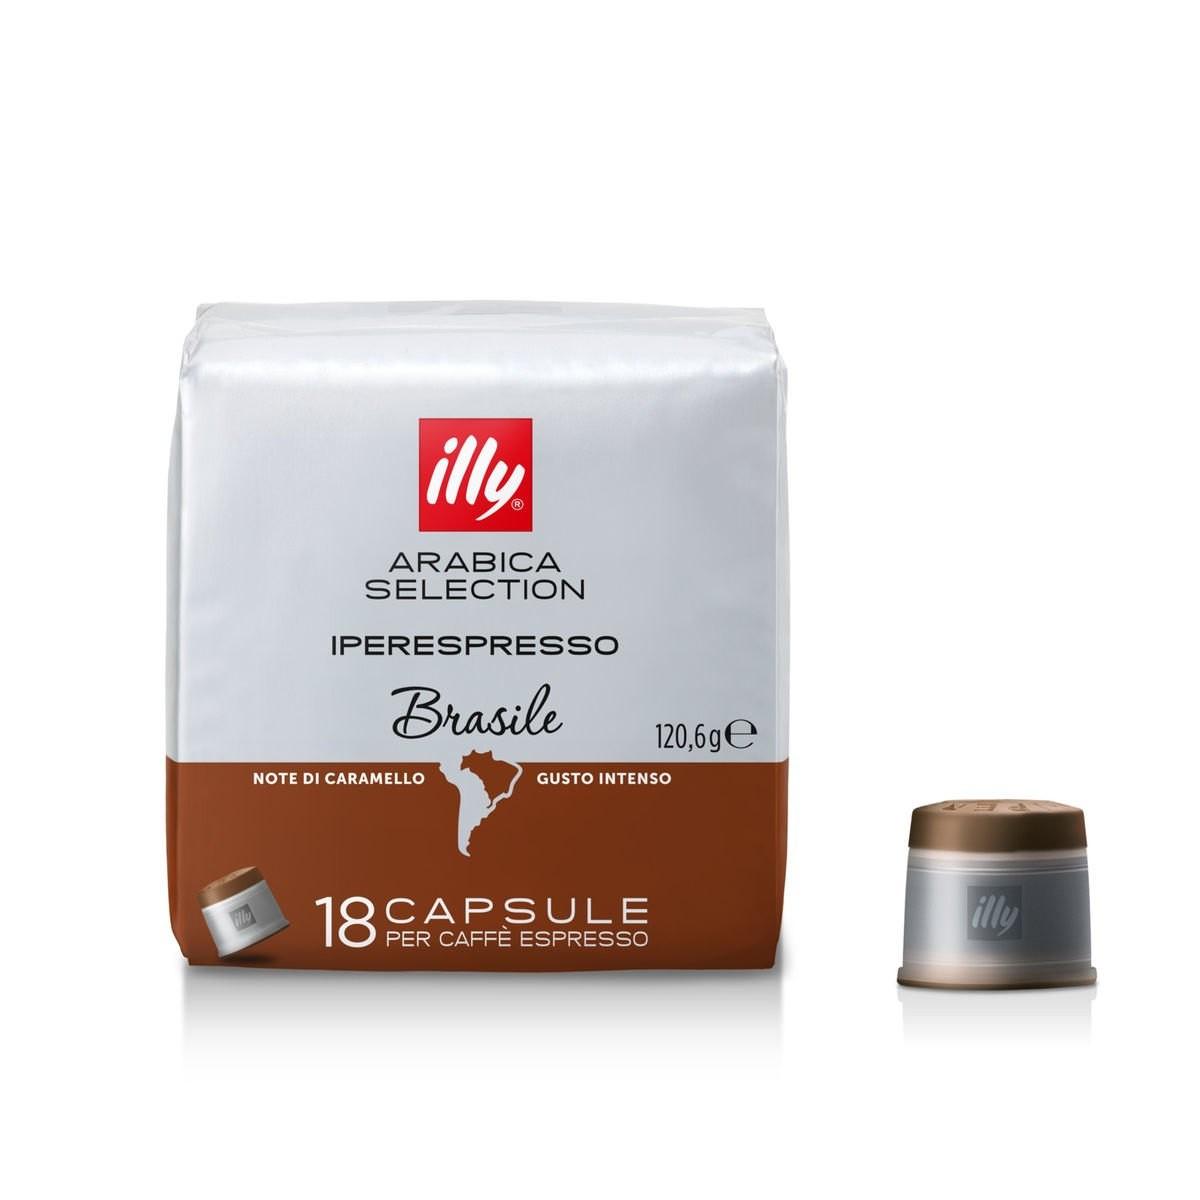 Кава в капсулах illy IperEspresso Brasile 18 шт., Італія (Іллі айпер)